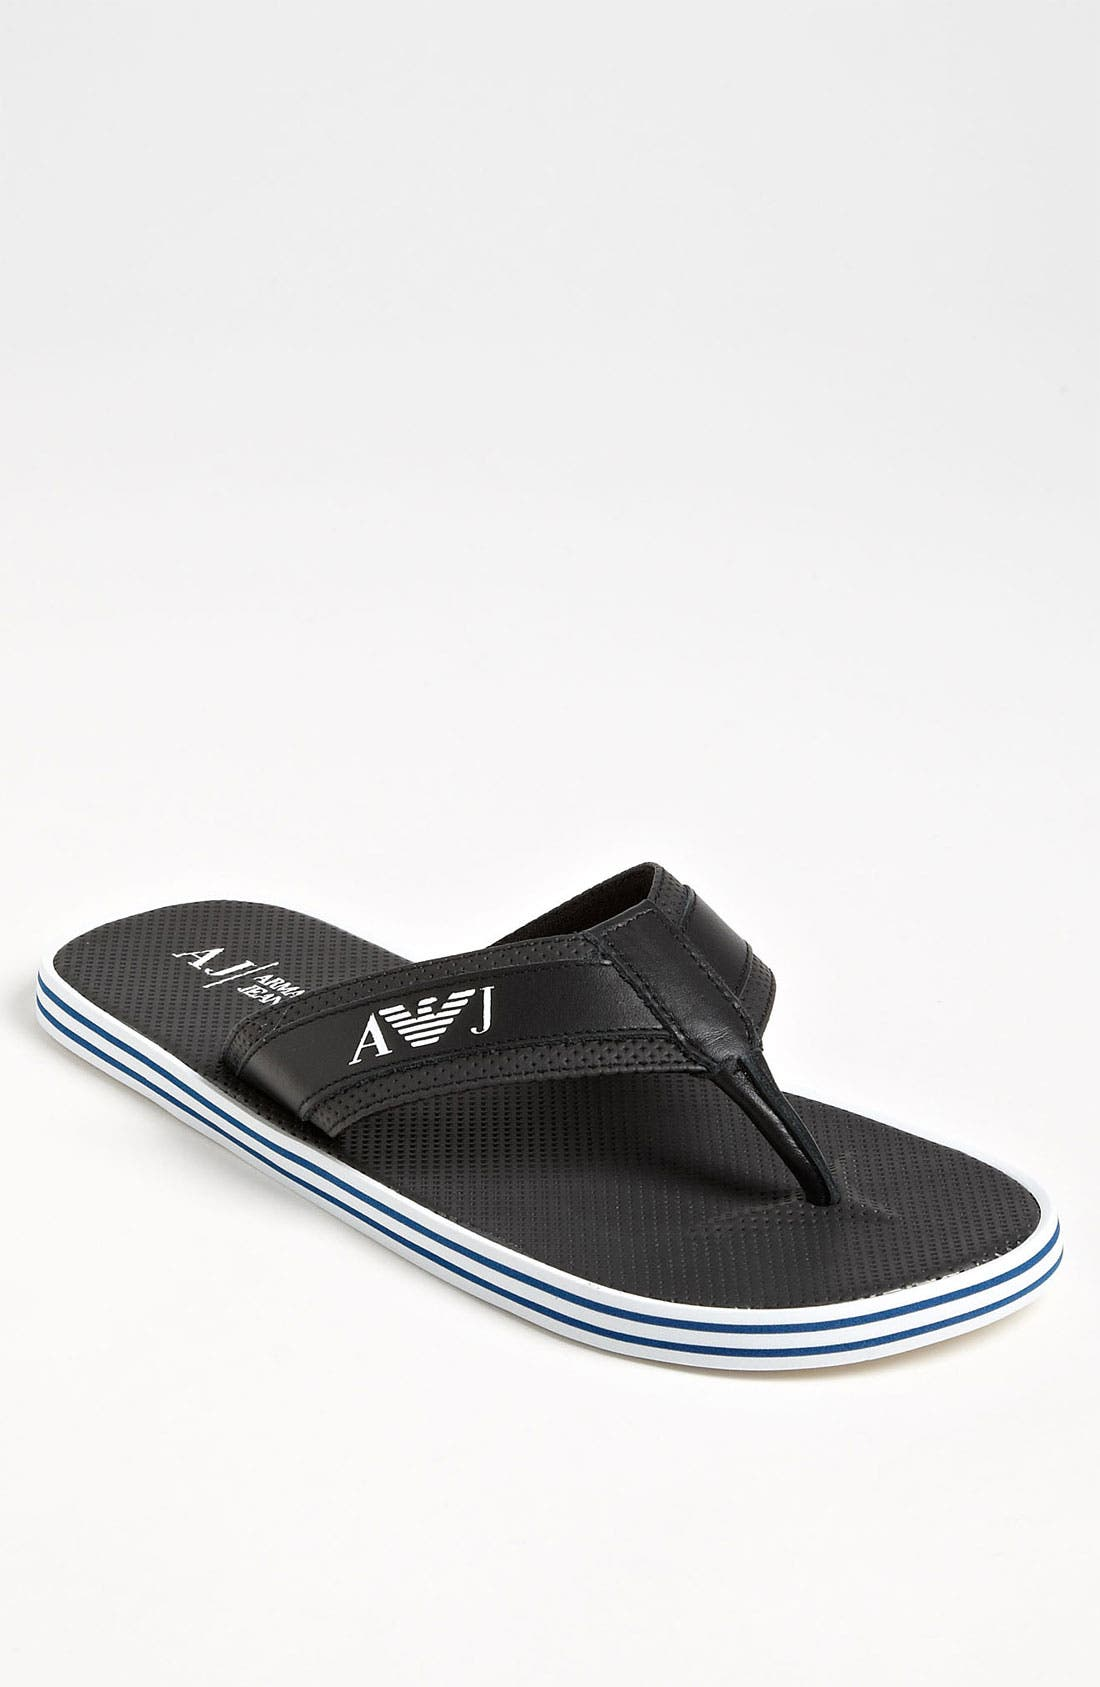 Alternate Image 1 Selected - Armani Jeans Flip Flop